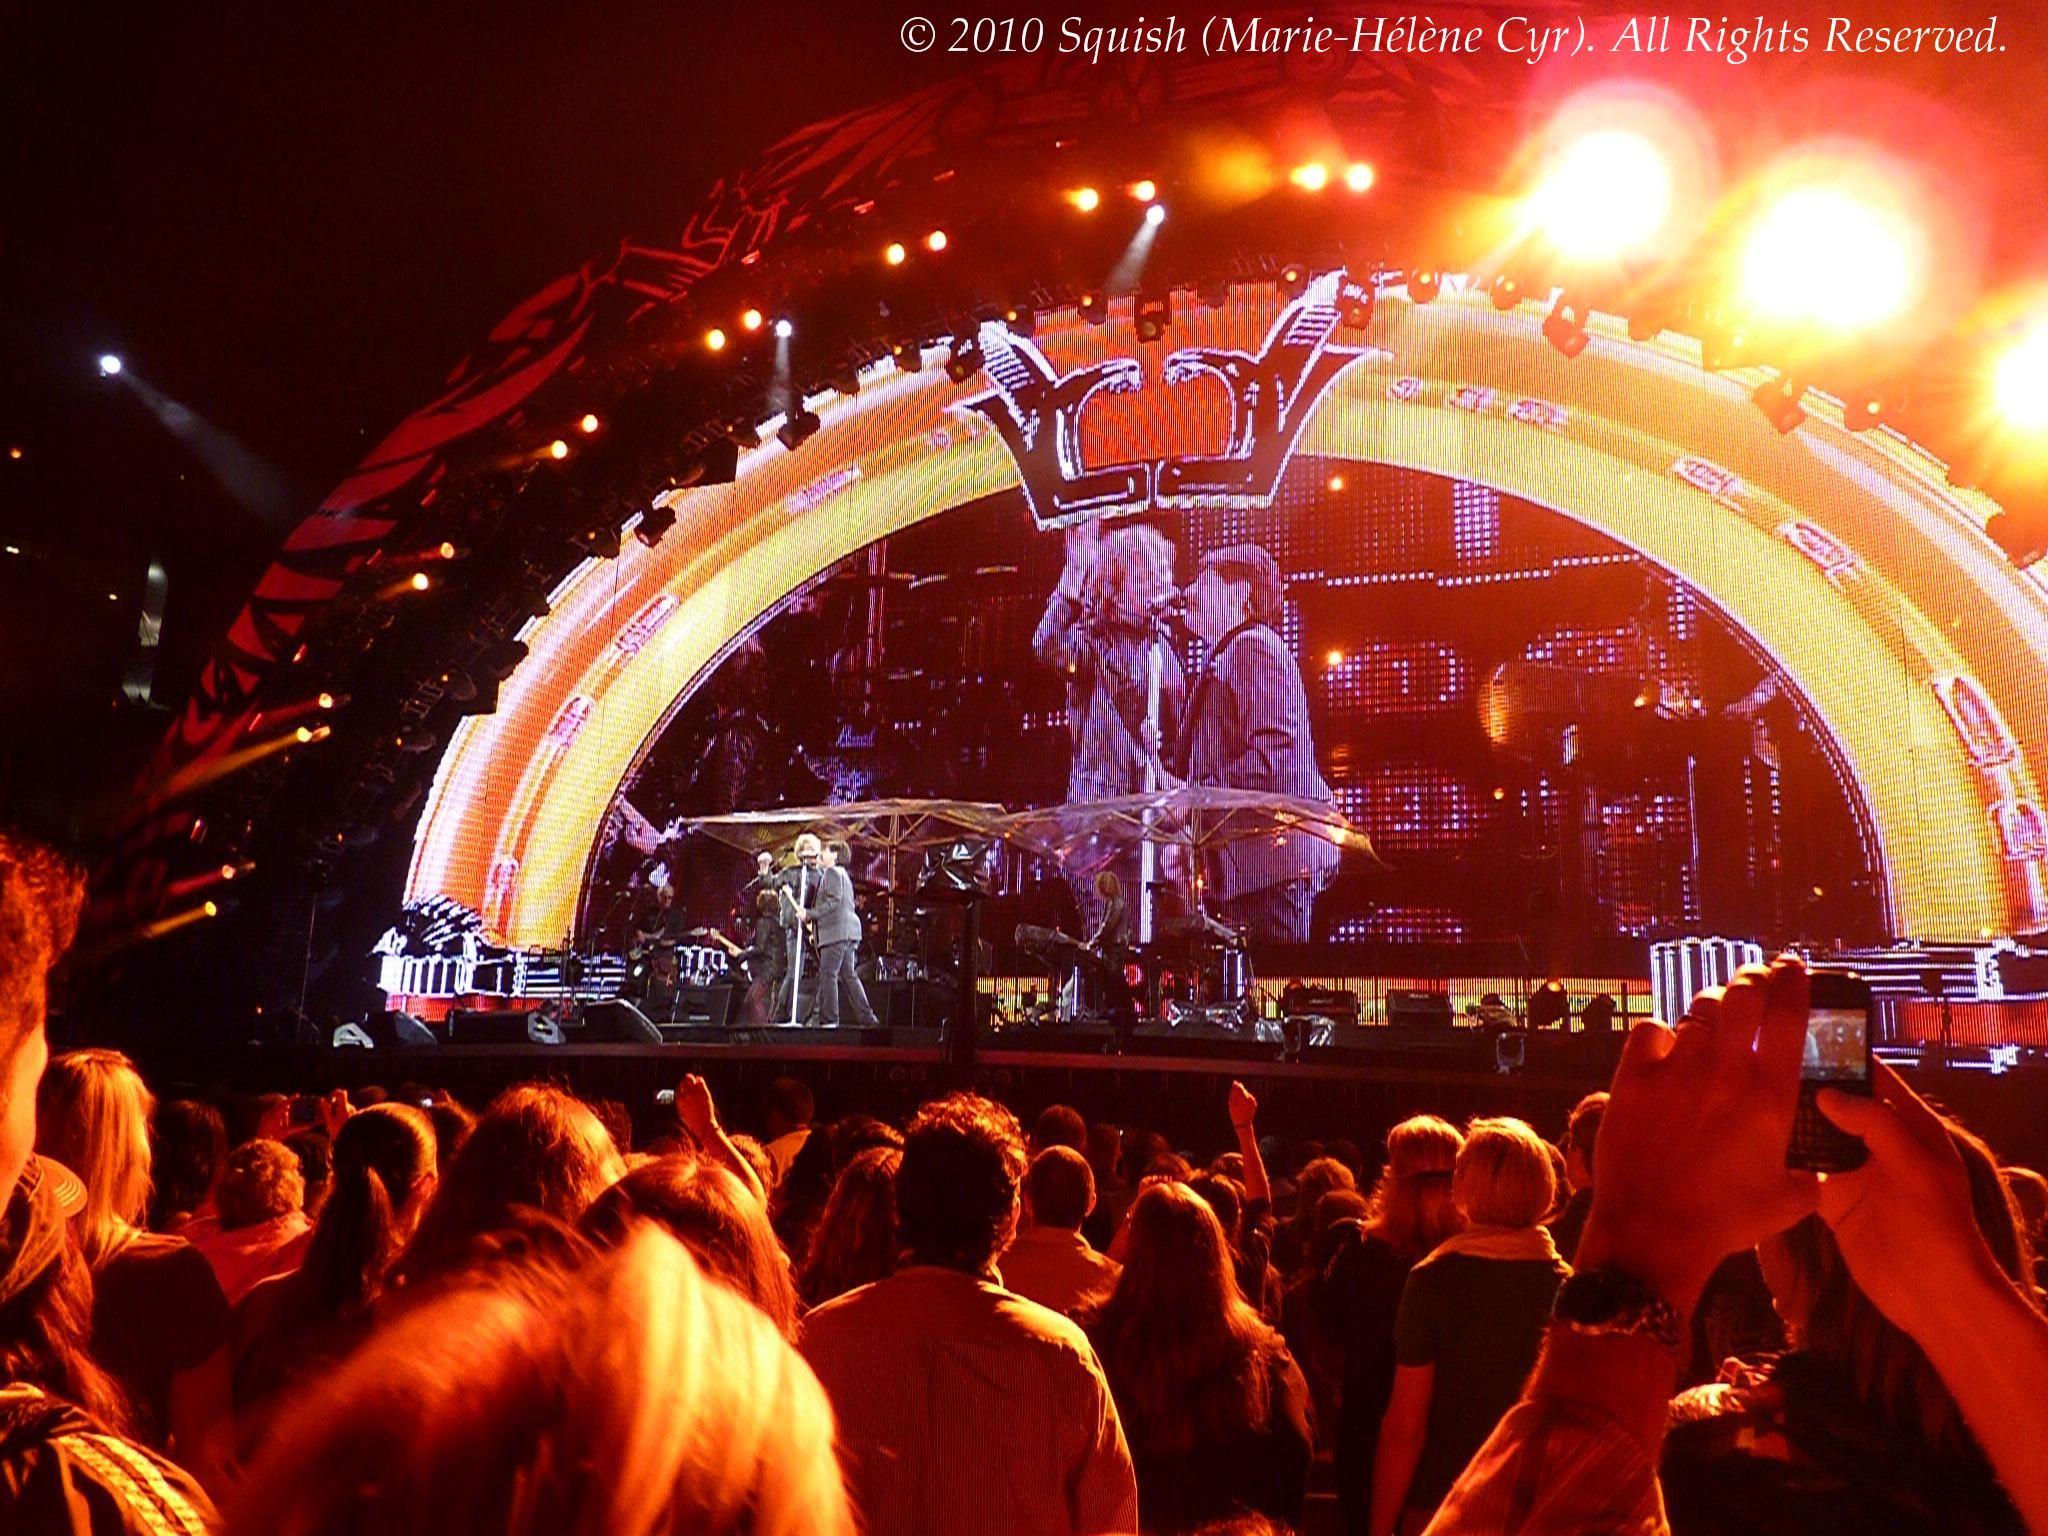 Bon Jovi - New Meadowlands Stadium, NJ, USA (May 27, 2010)